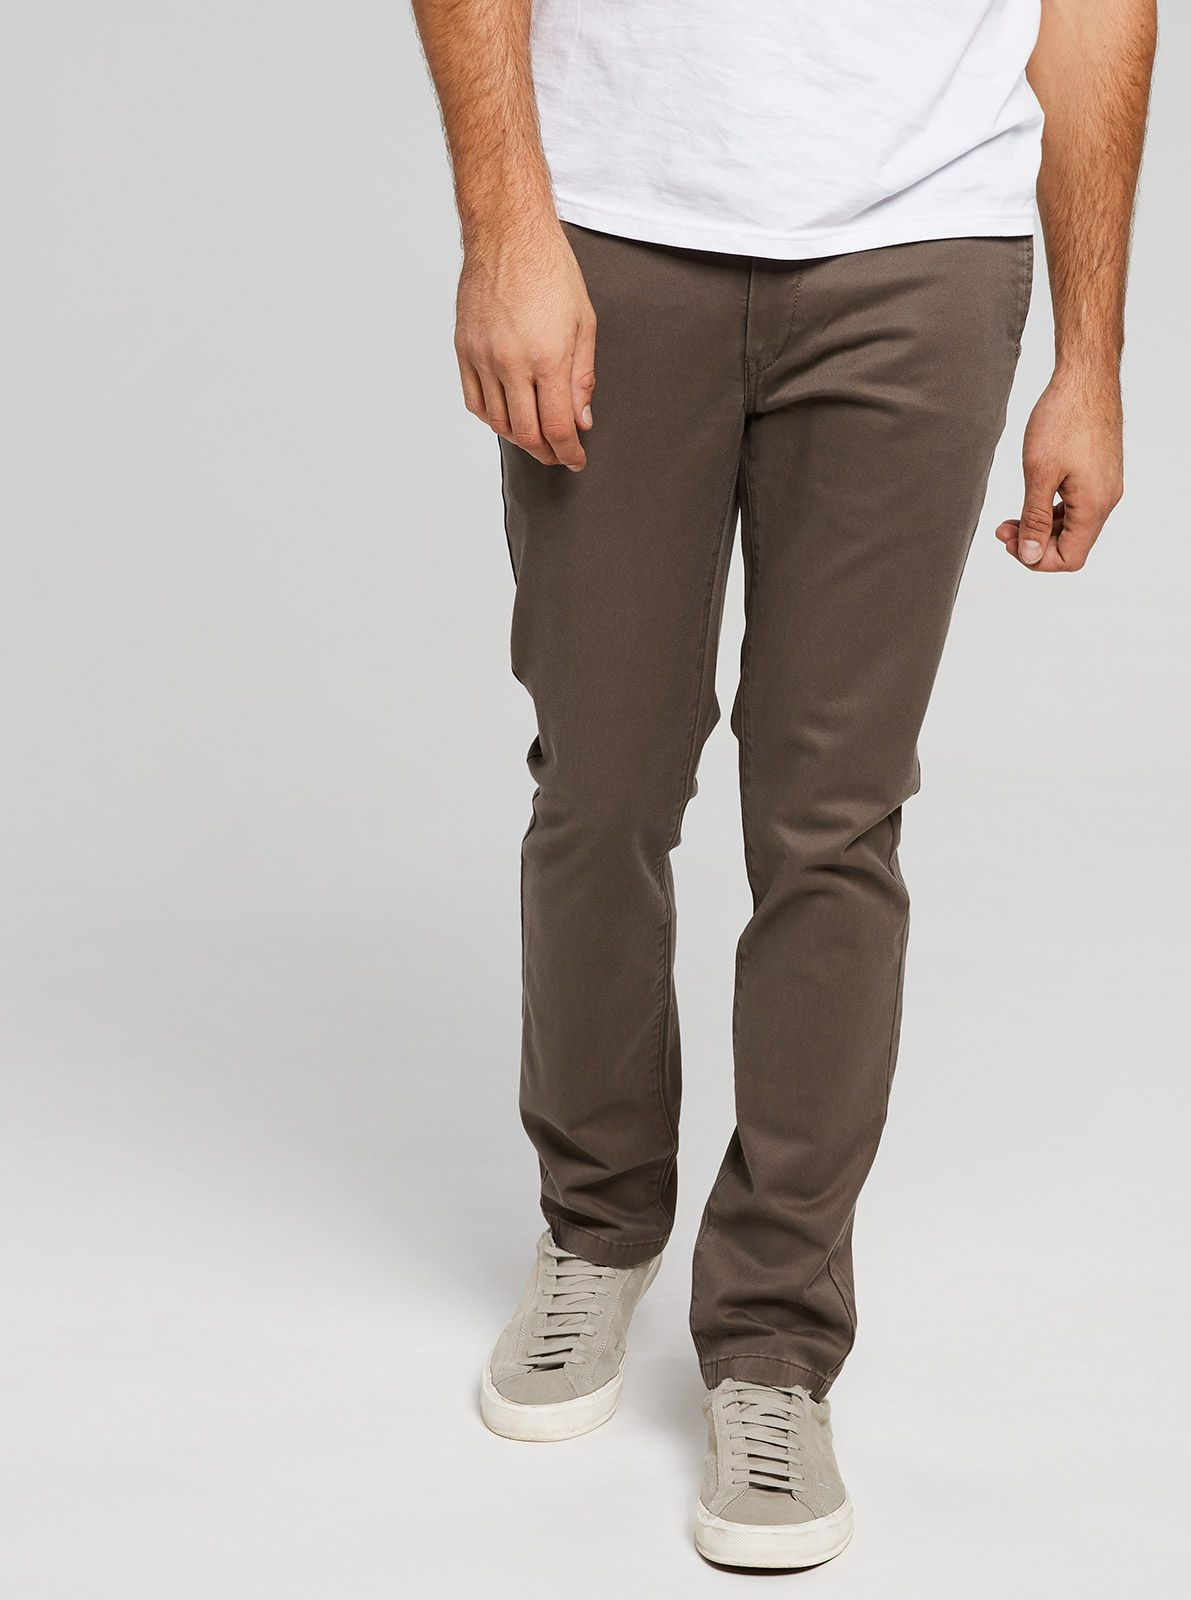 799c0d65fcfd4 Levi s 511 Slim Chino In Basalt Grey